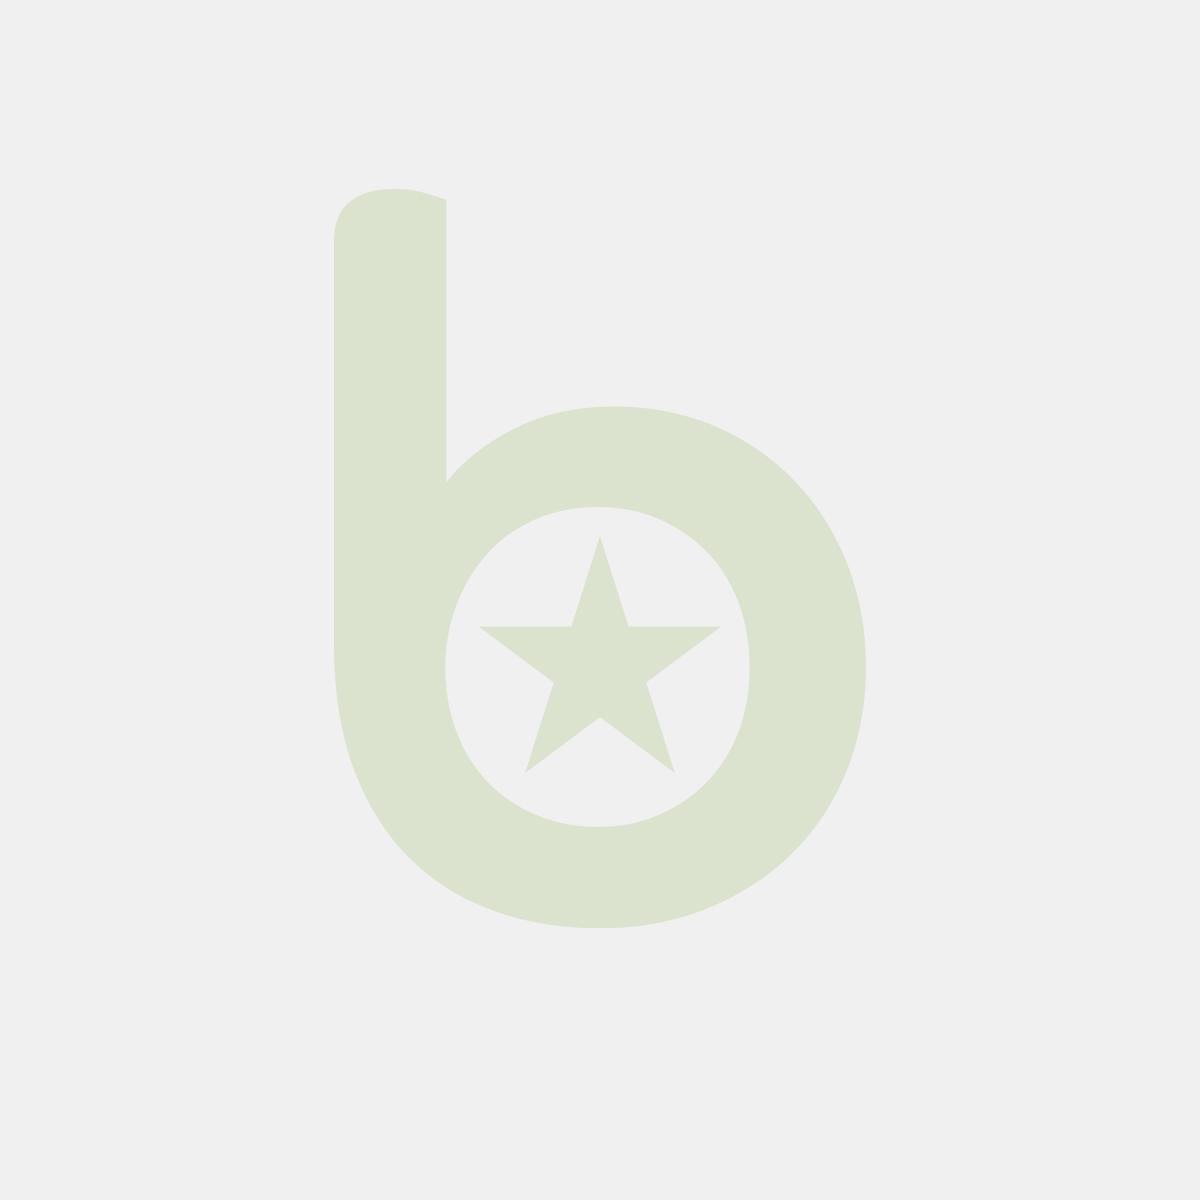 FINGERFOOD - mini patelnia Eskoffie z trzciny cukrowej PLA, 25ml, 9,1x5,6x1,4cm, op. 50 sztuk